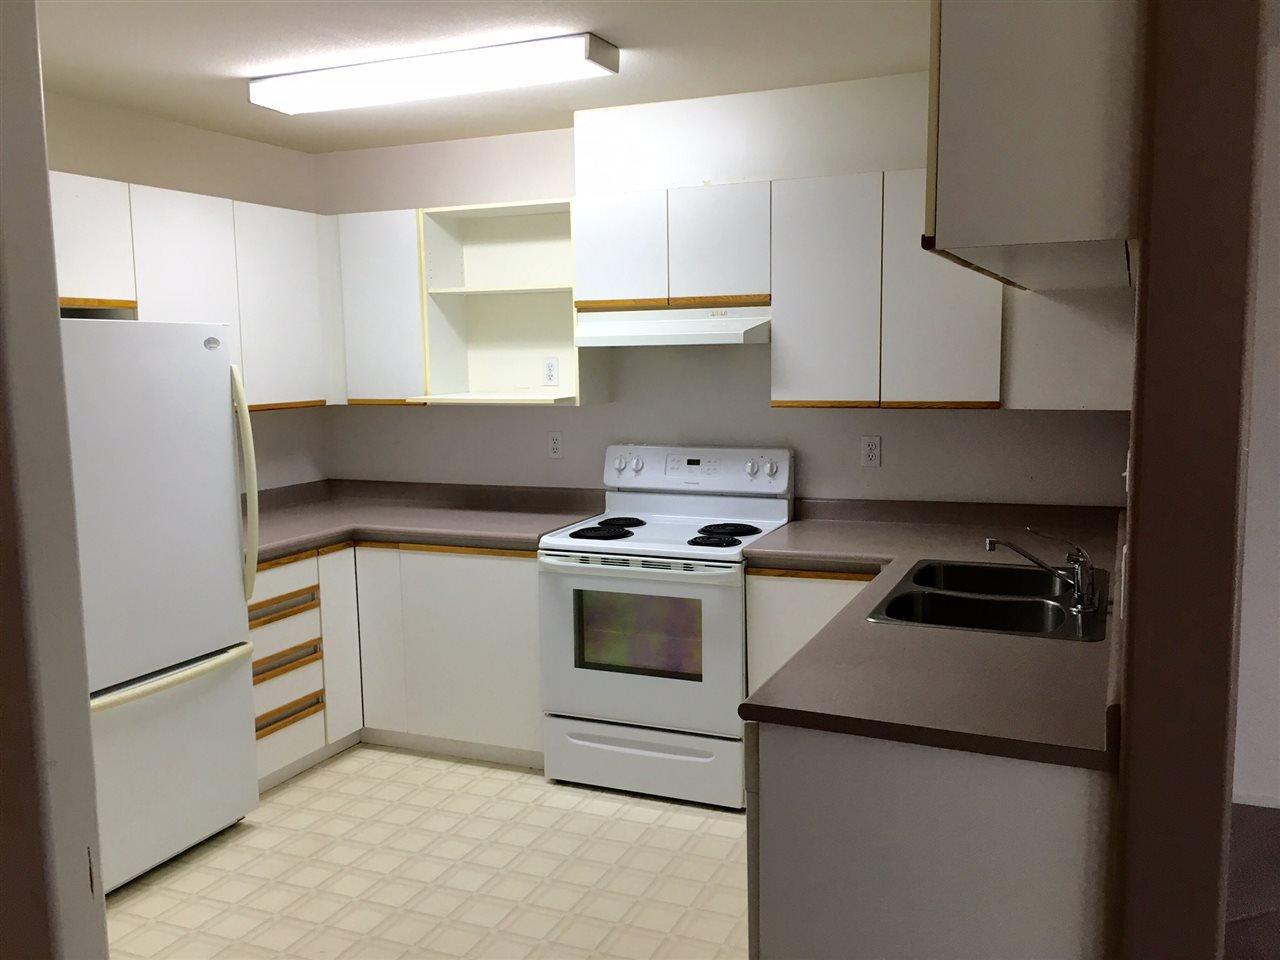 "Photo 3: Photos: 207 27358 32 Avenue in Langley: Aldergrove Langley Condo for sale in ""Willow Creek"" : MLS®# R2207746"